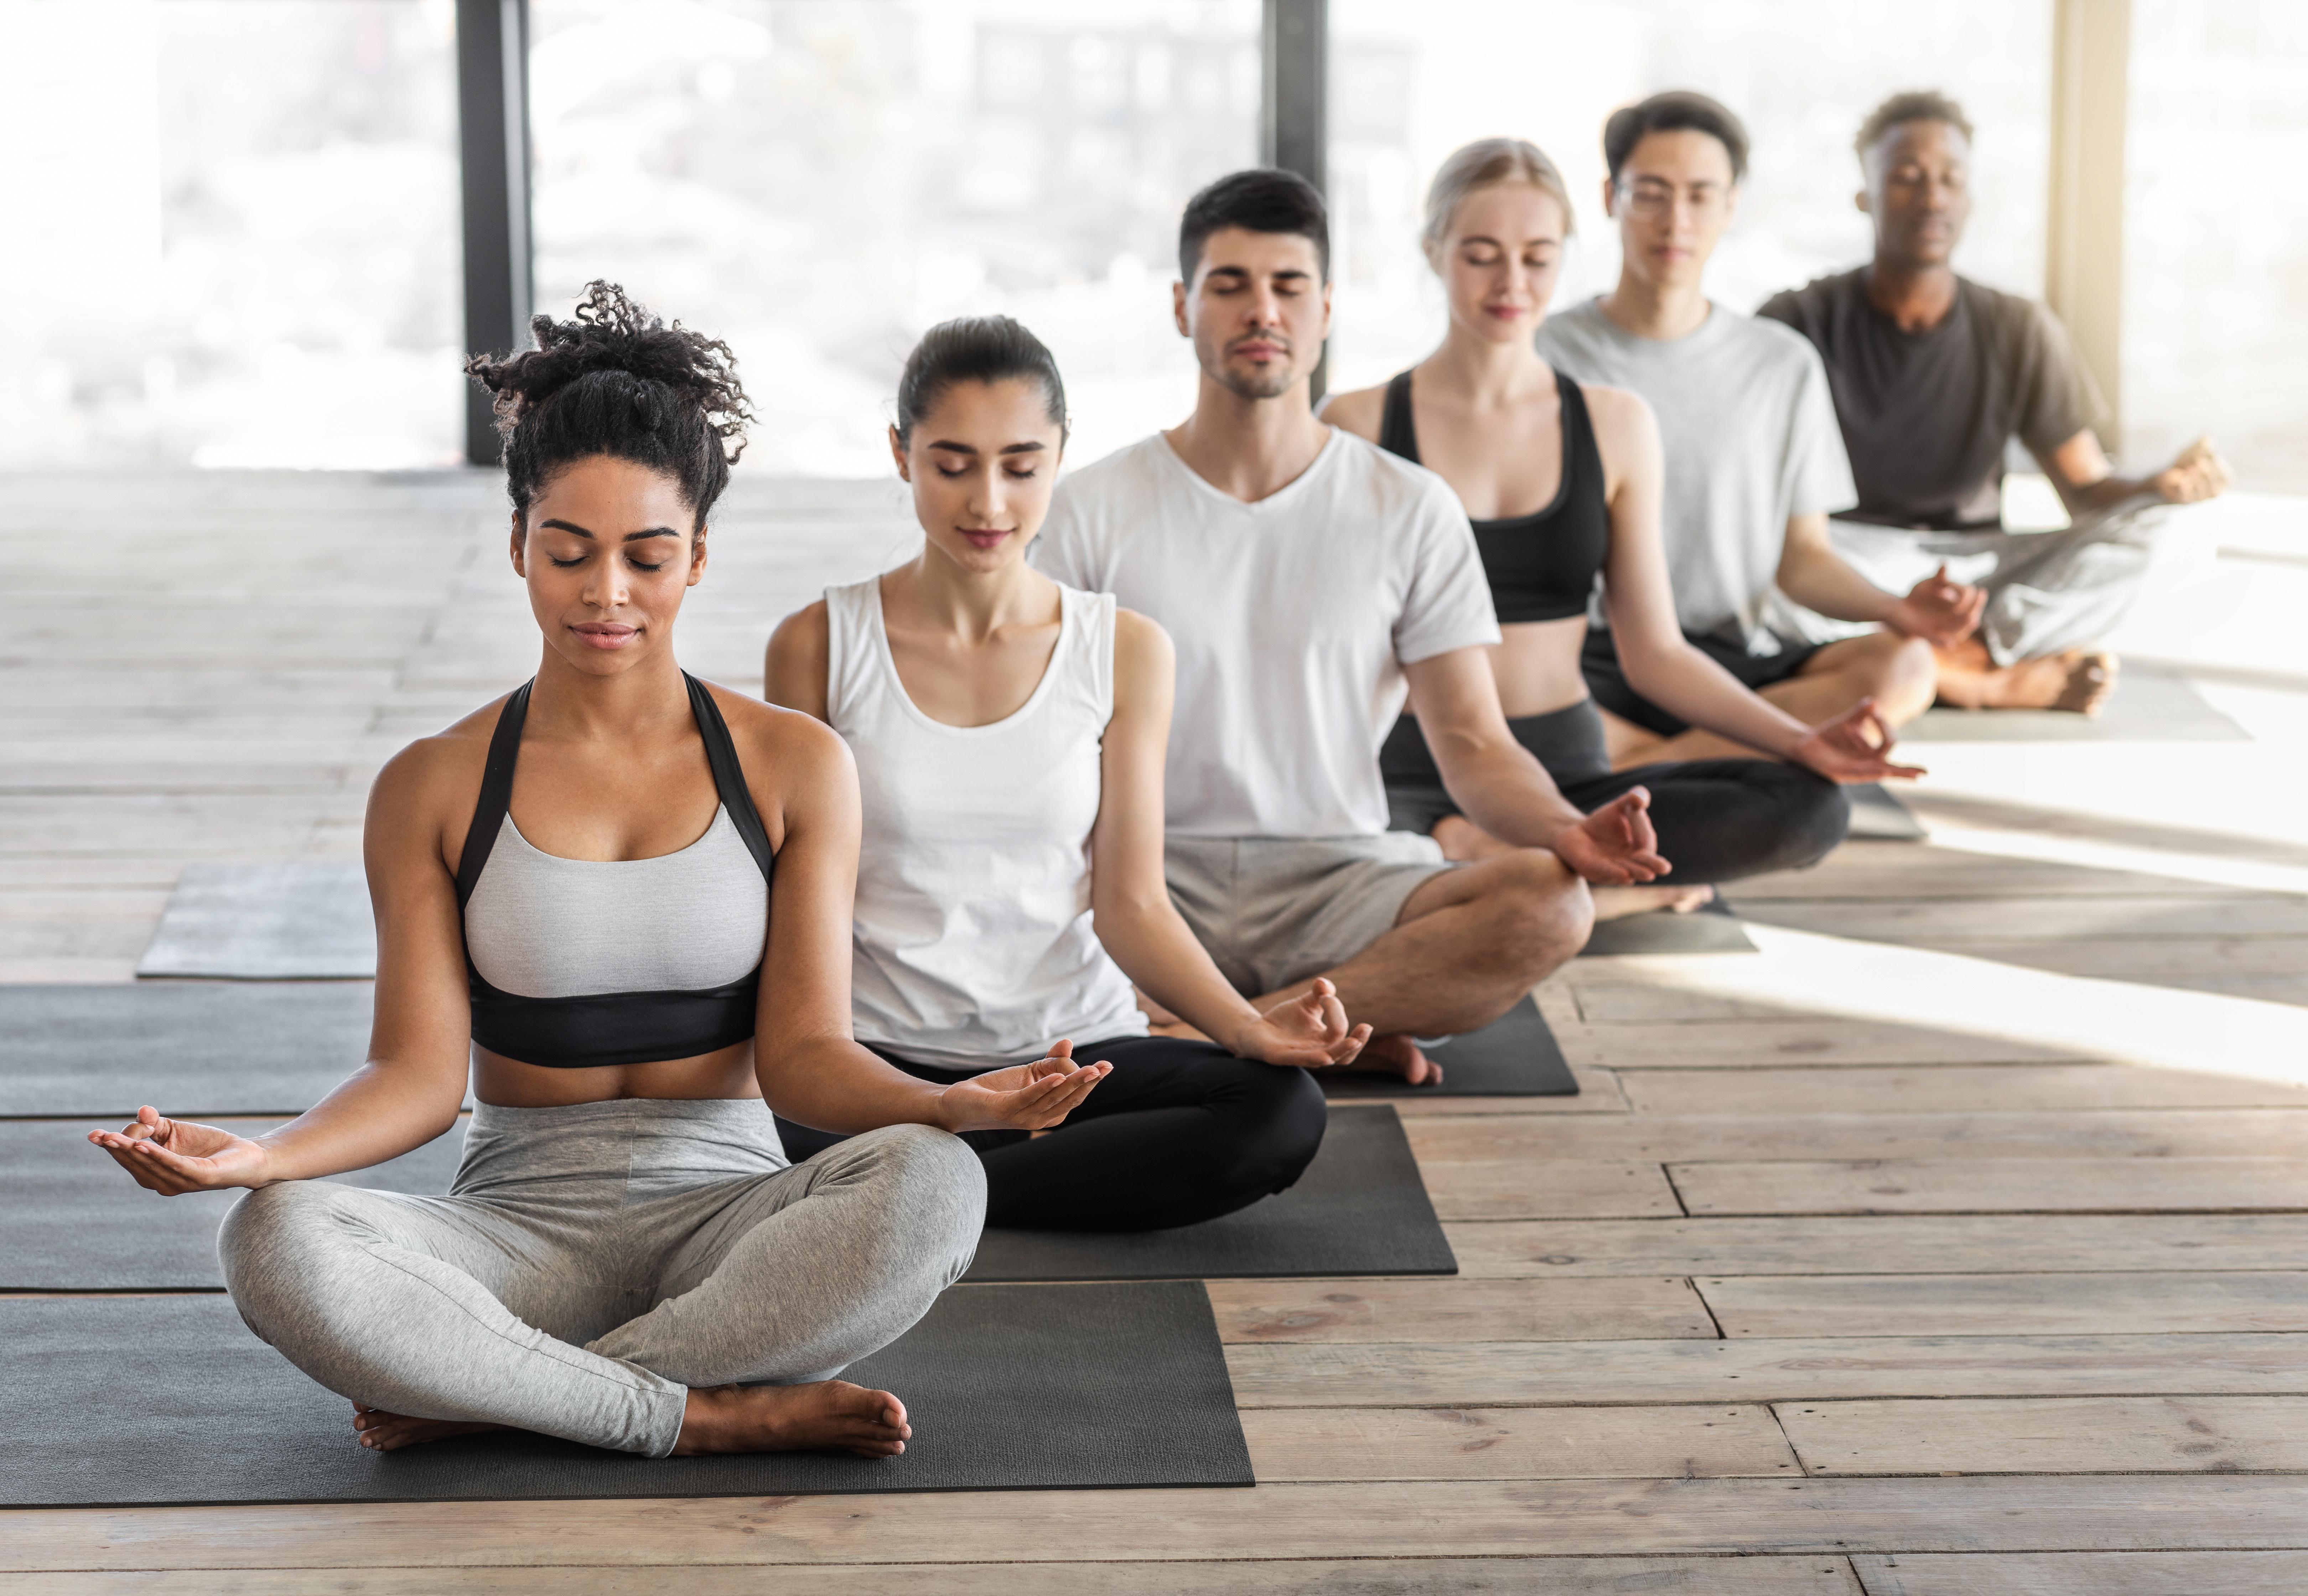 Group meditating during wellness program activity